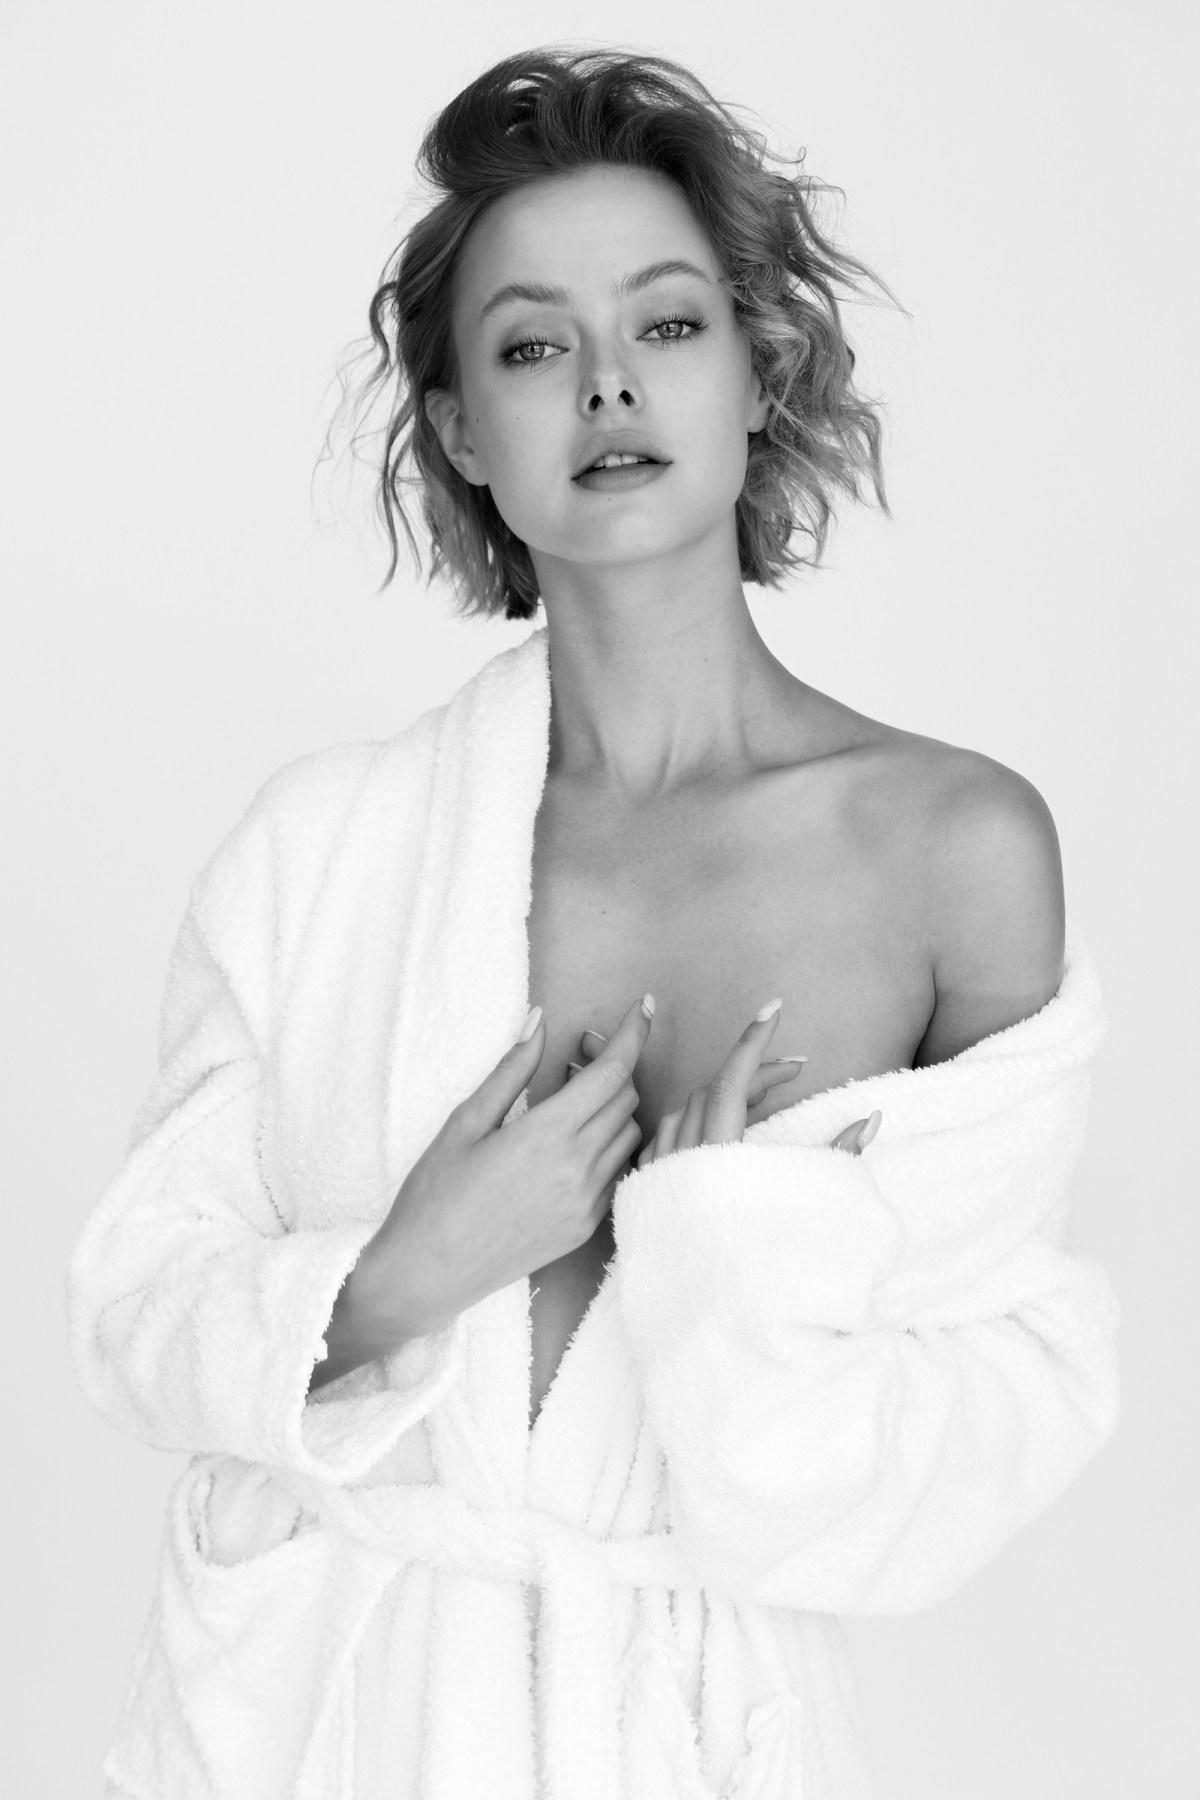 Alexandra Ola